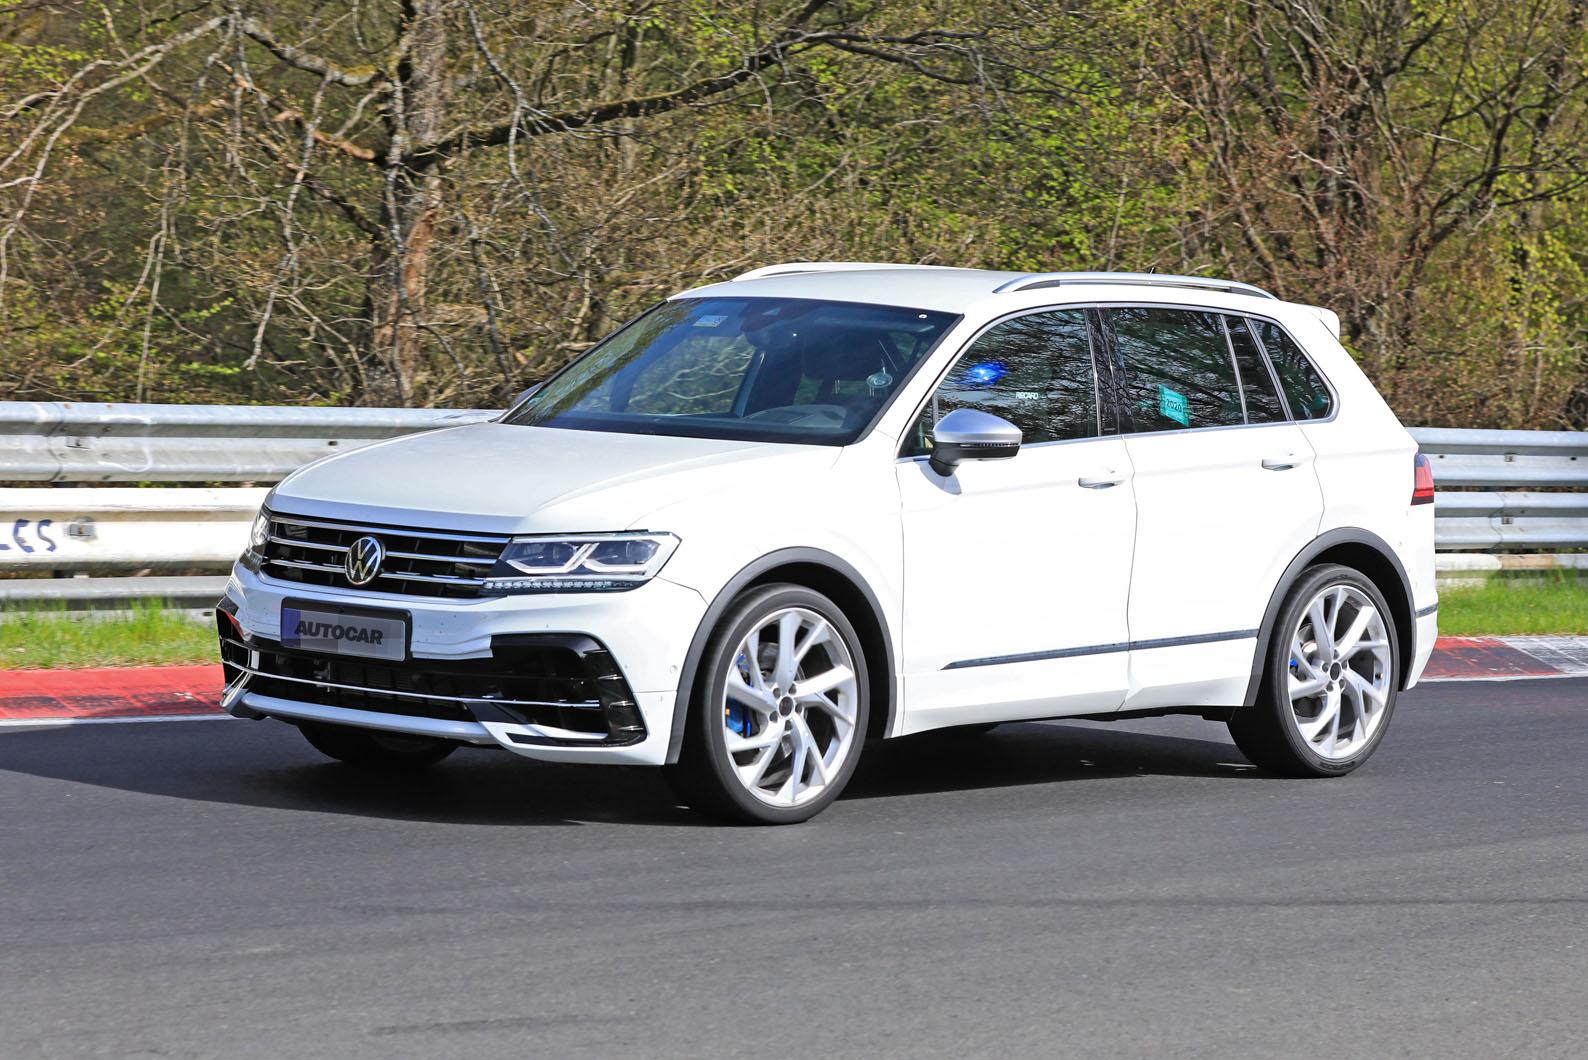 24 World News 2020 Volkswagen Tiguan R Prototype Previews Suv S Facelift